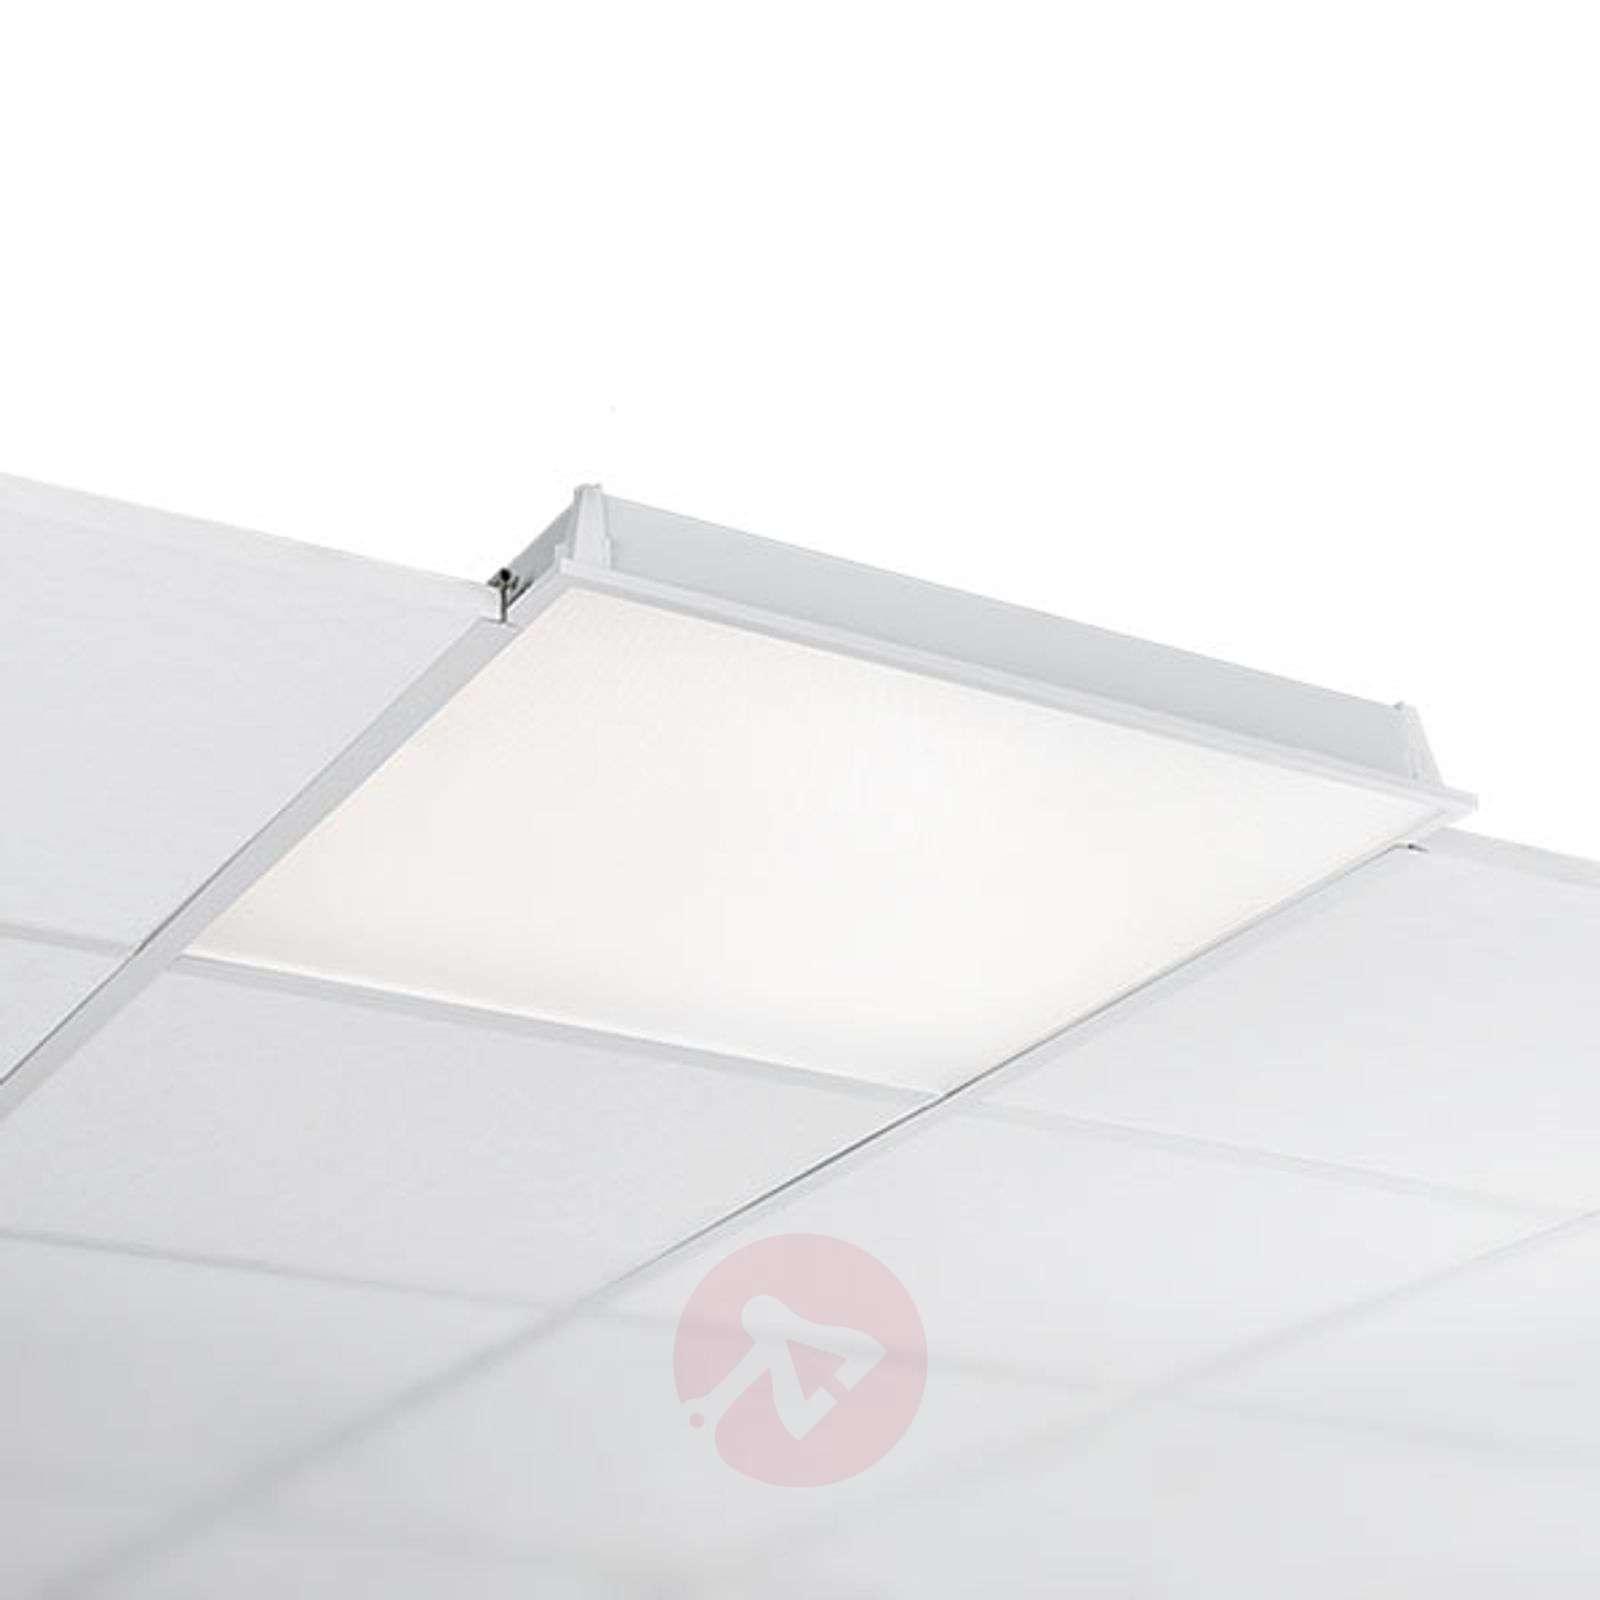 Recessed ceiling light C90-R 625 x 625 4000 HF LED-6040229-01